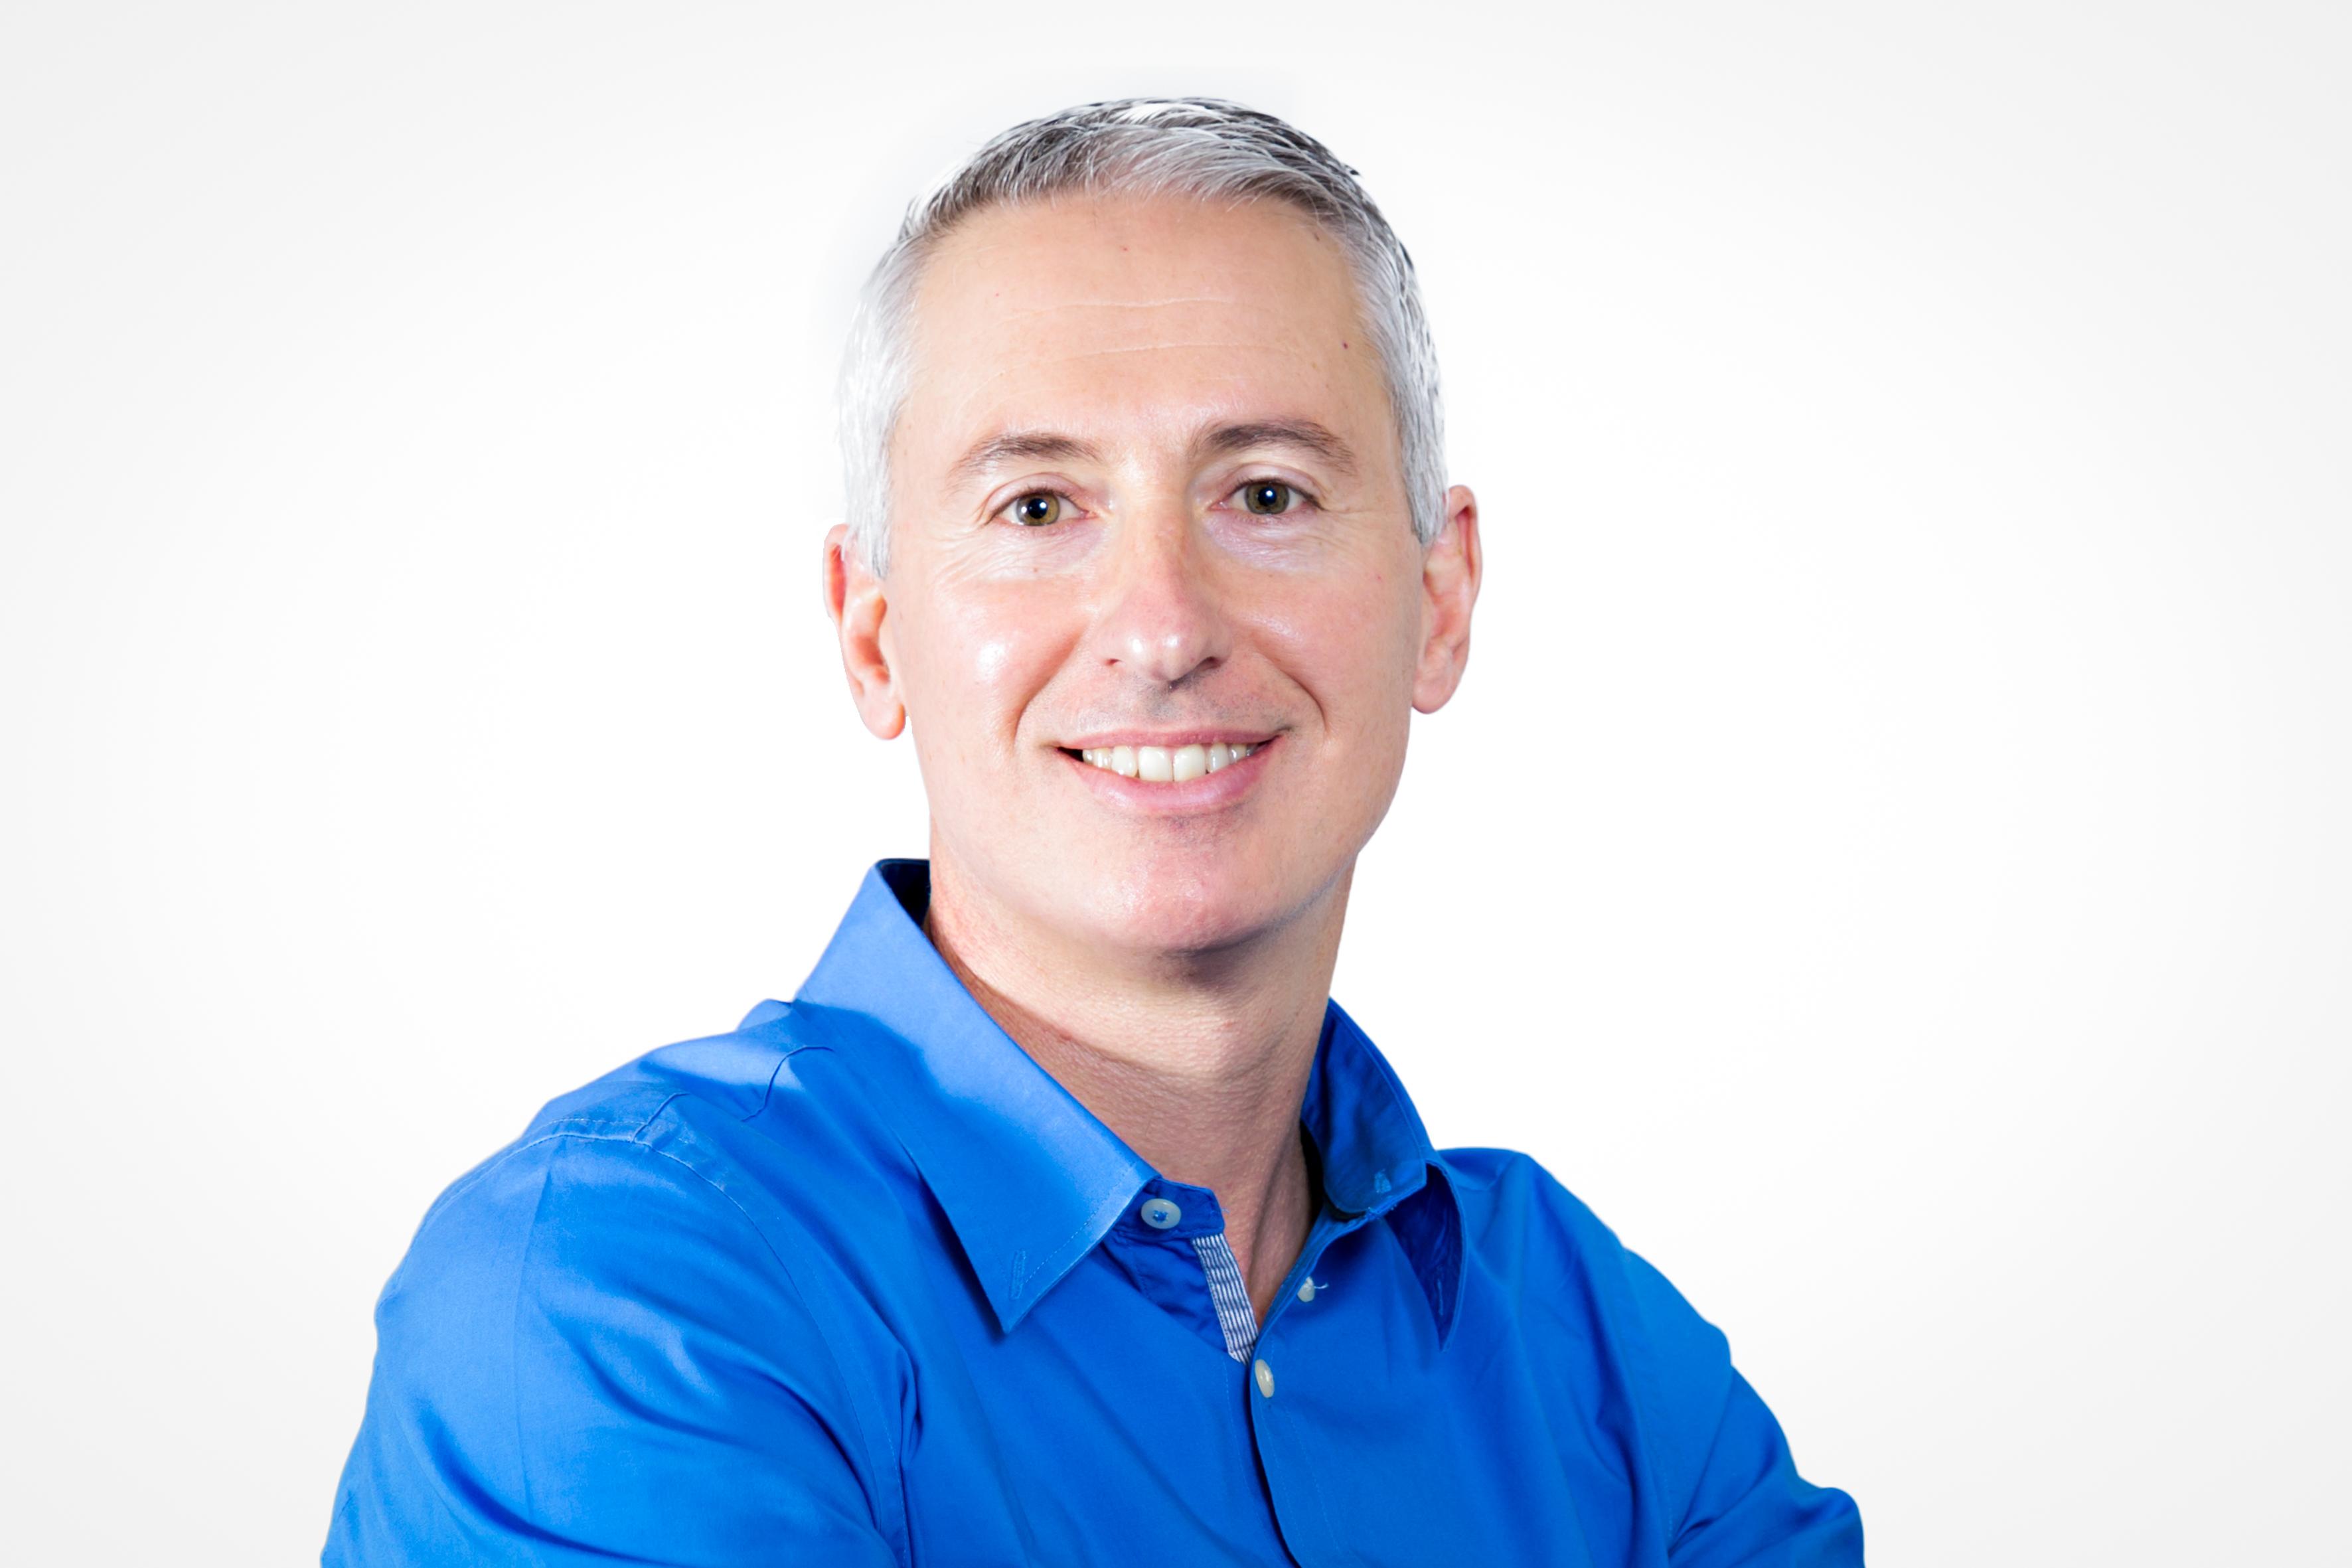 Picture of Rowan De Klerk – CEO, South Africa